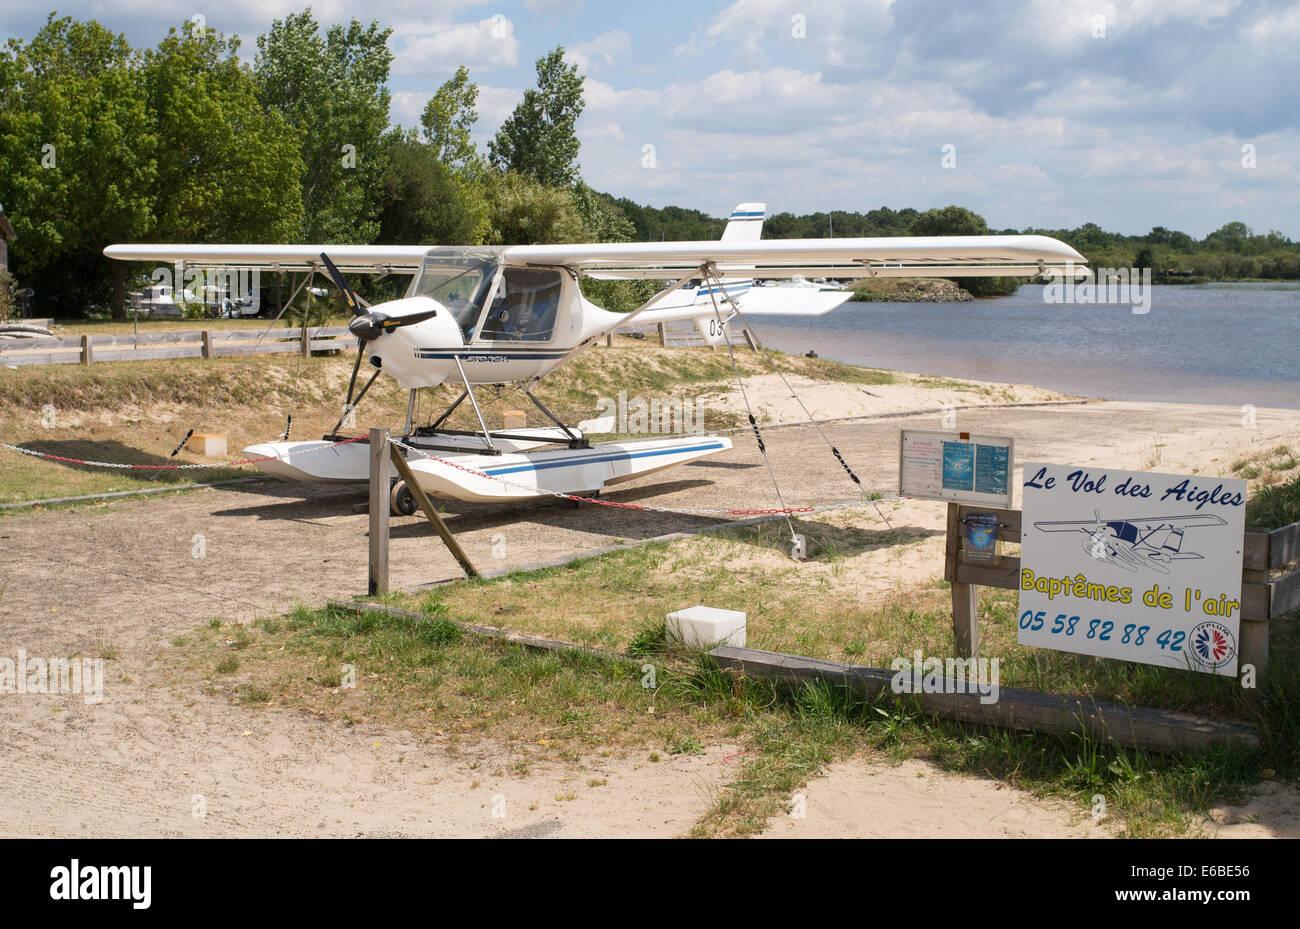 Storch flying boat Biscarrosse lake, Landes, Aquitaine, France, Europe - Stock Image